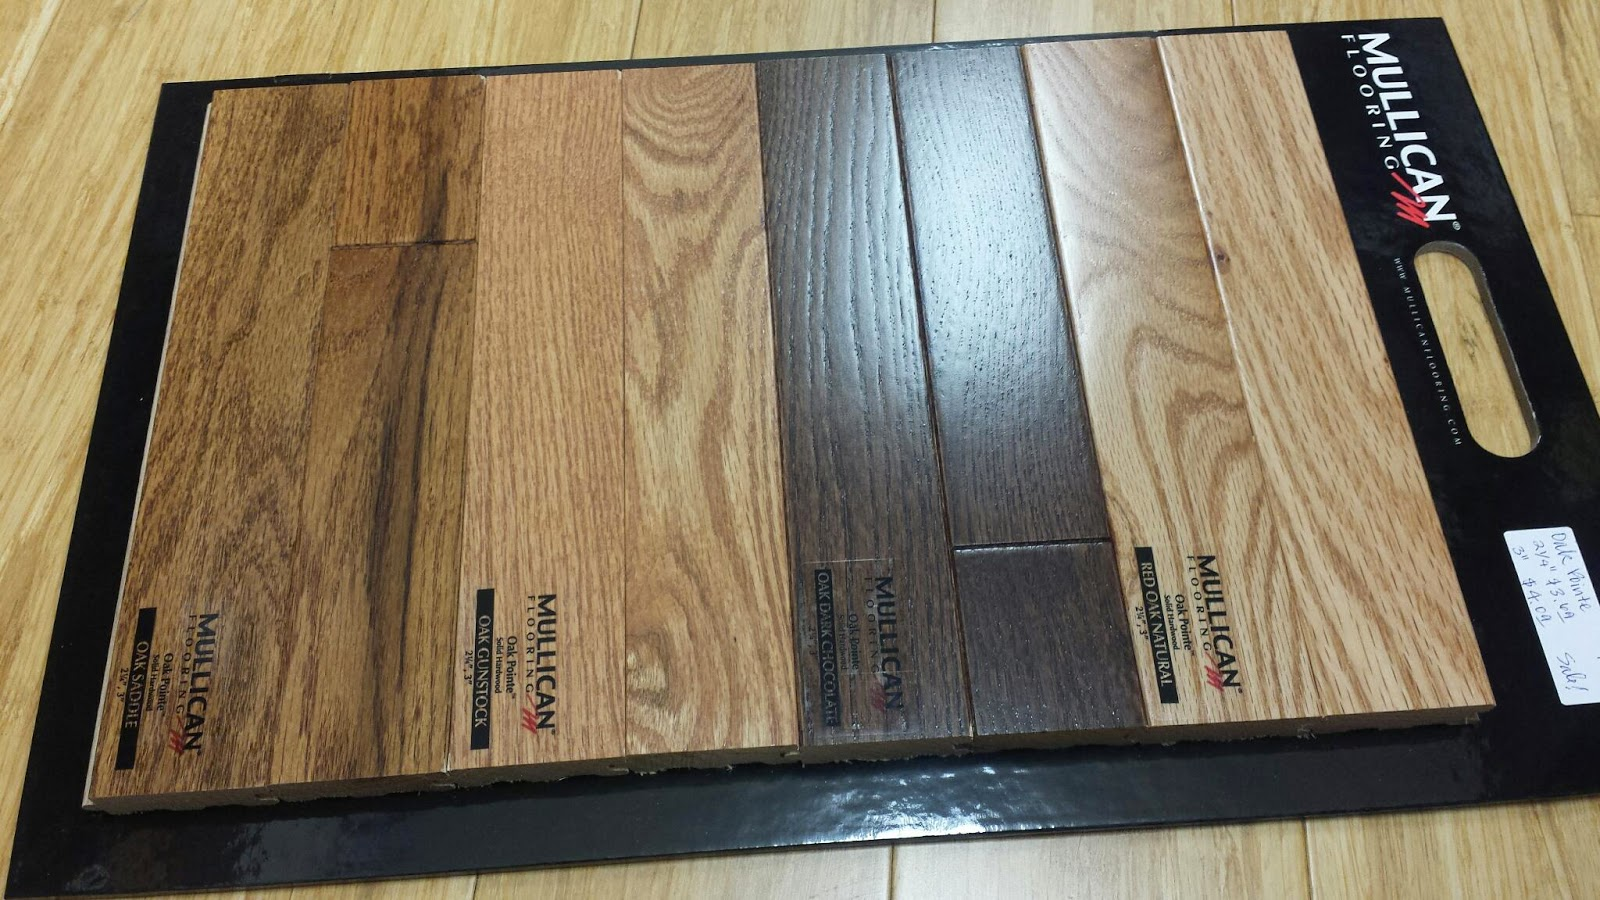 Mullican Oak Pointe Hardwood Flooring, New Jersey, Nj, New York City